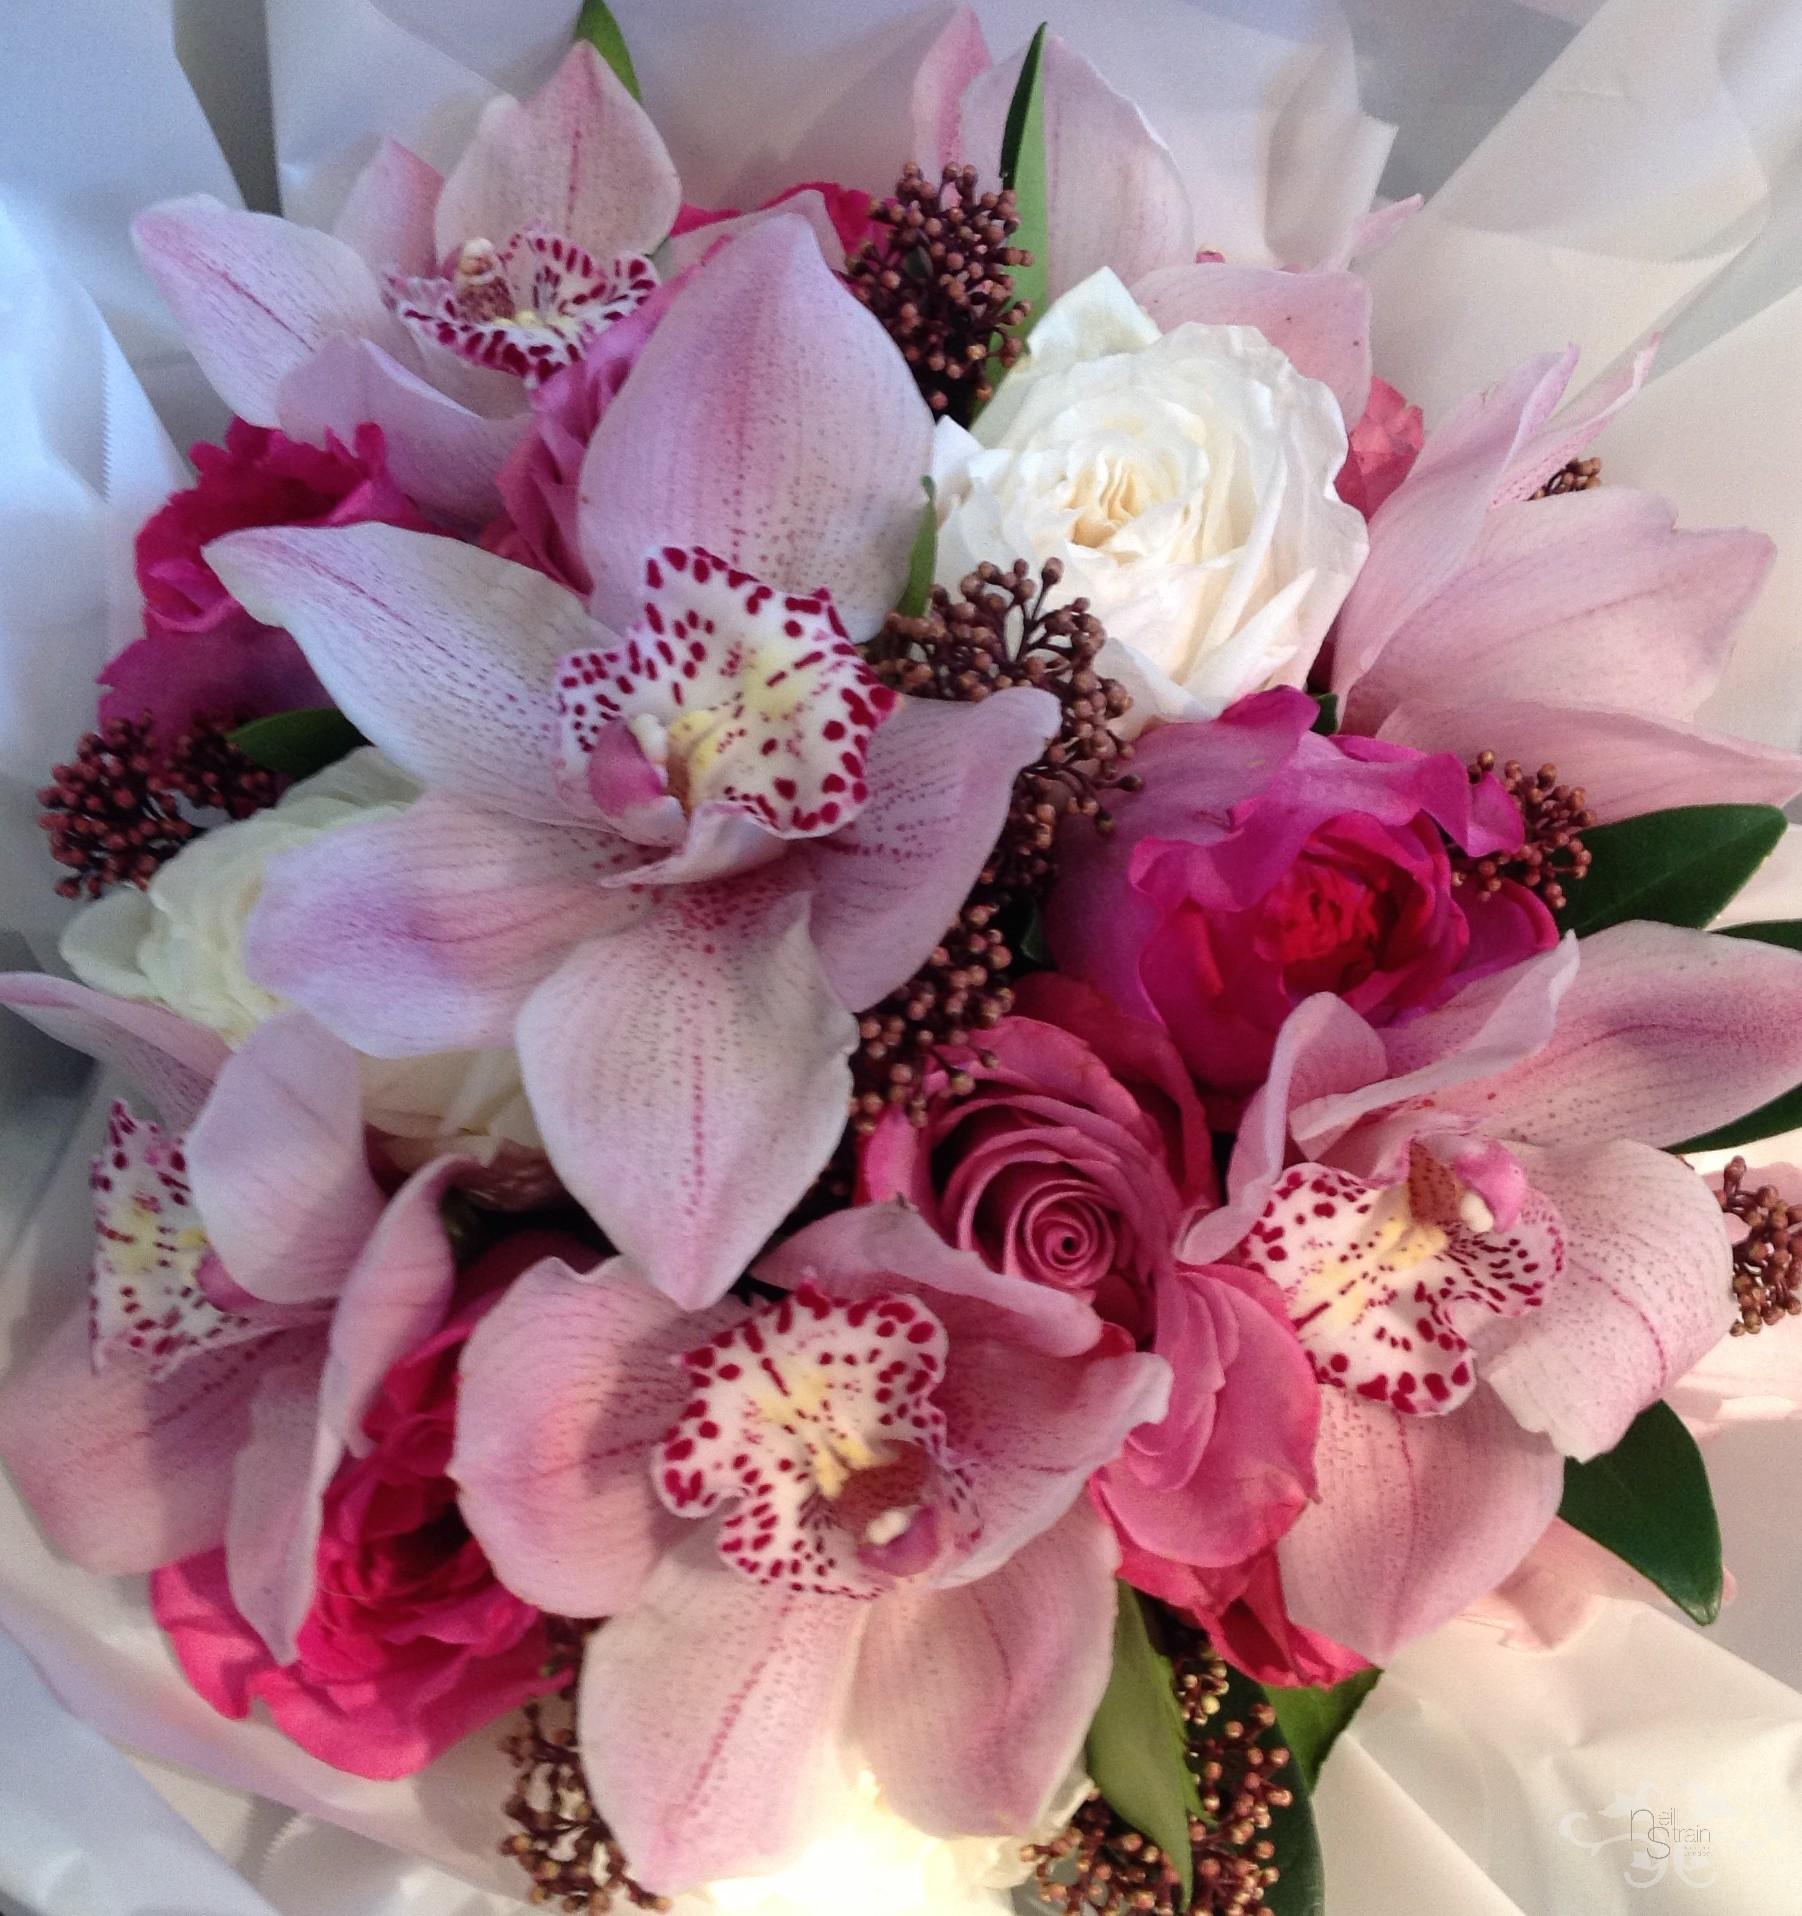 Roses, Cymbidium Orchids and Skimmia